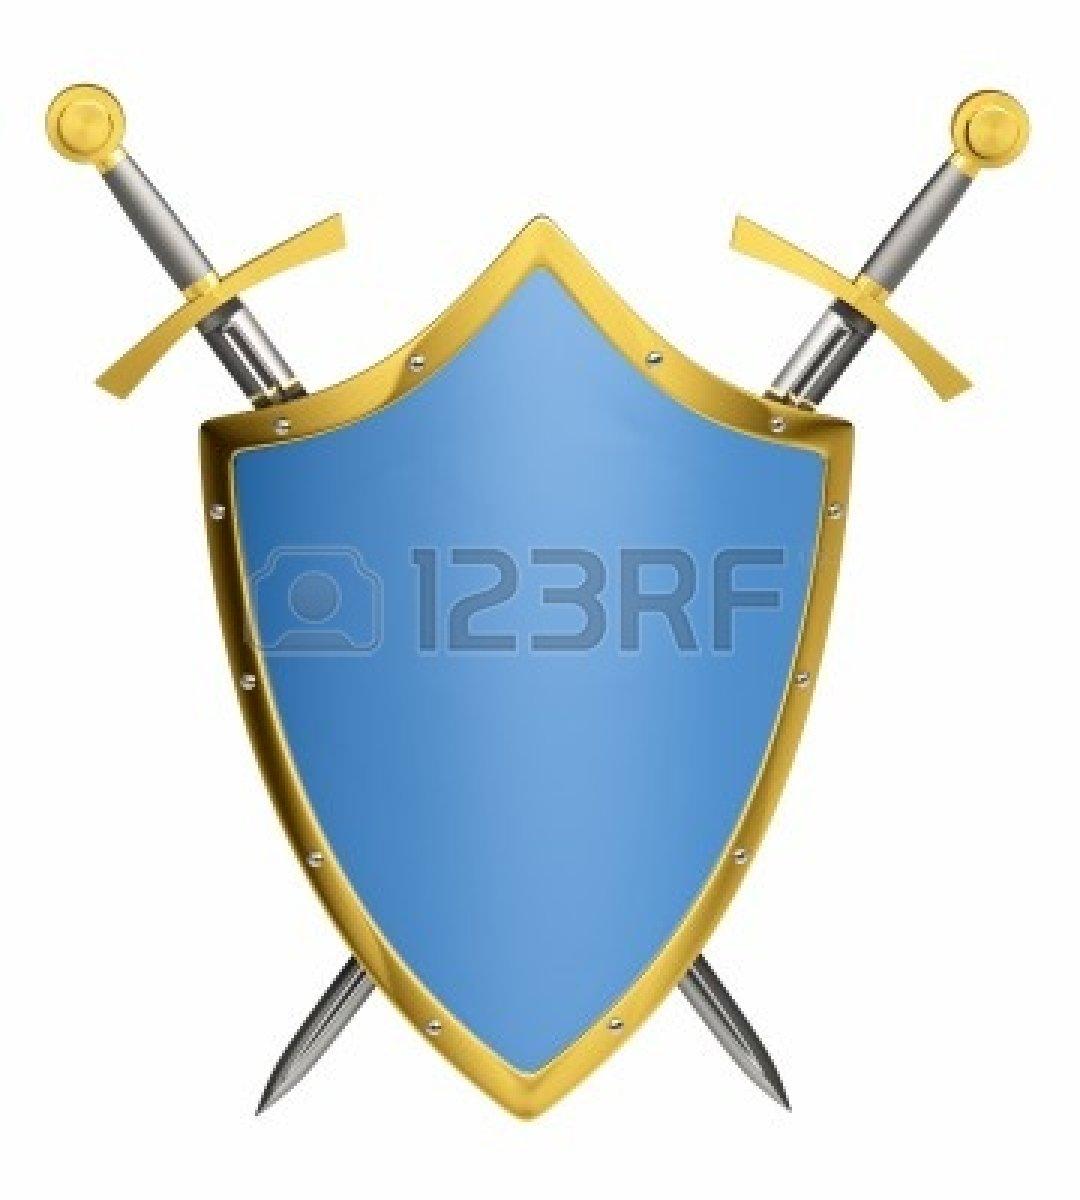 Batman clipart shield Free And Medieval Panda medieval%20sword%20and%20shield